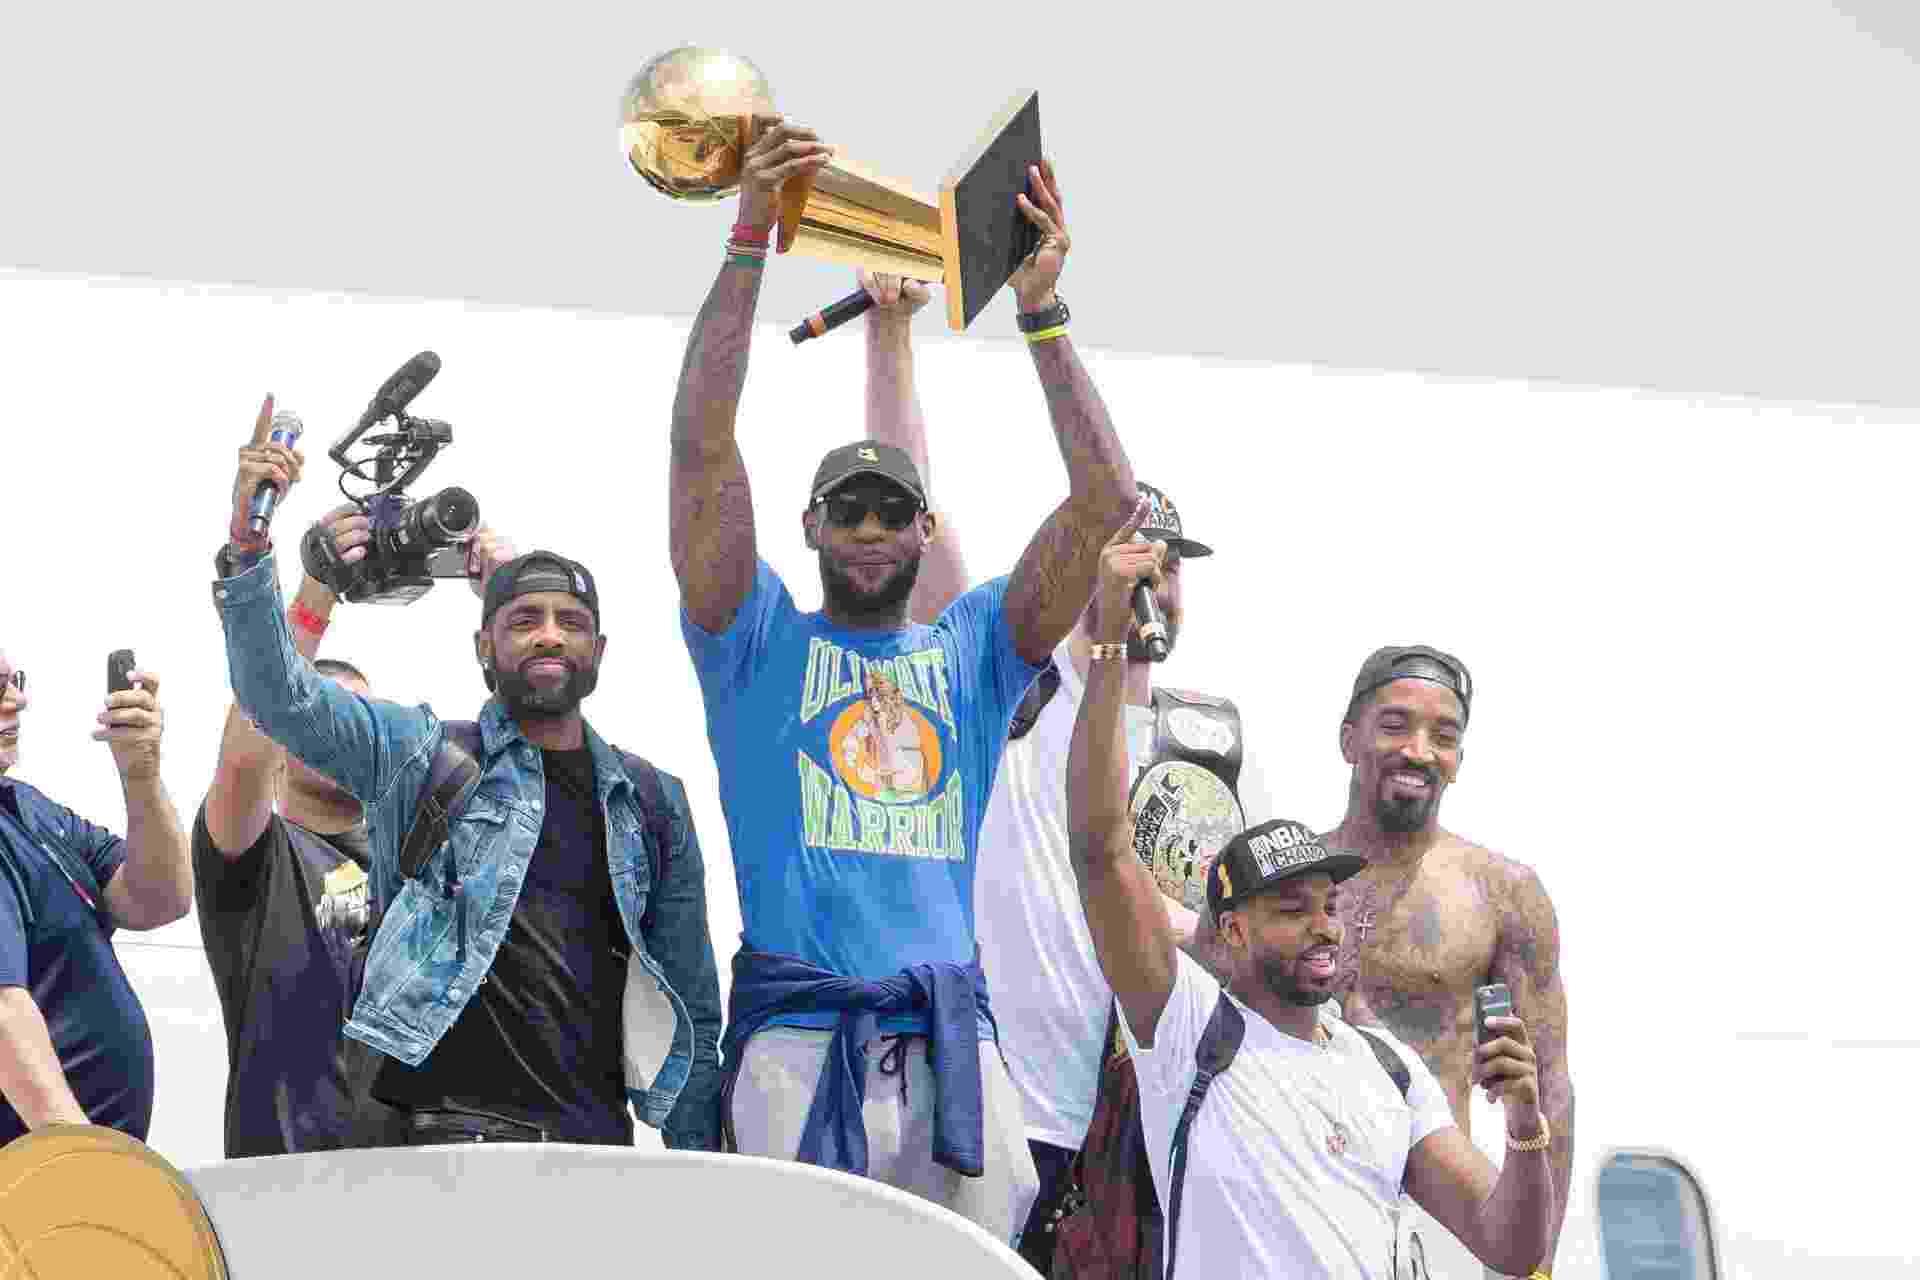 Cavaliers chegam a Cleveland após conquista do título da NBA sobre o Golden State Wariors - Jason Miller/Getty Images/AFP